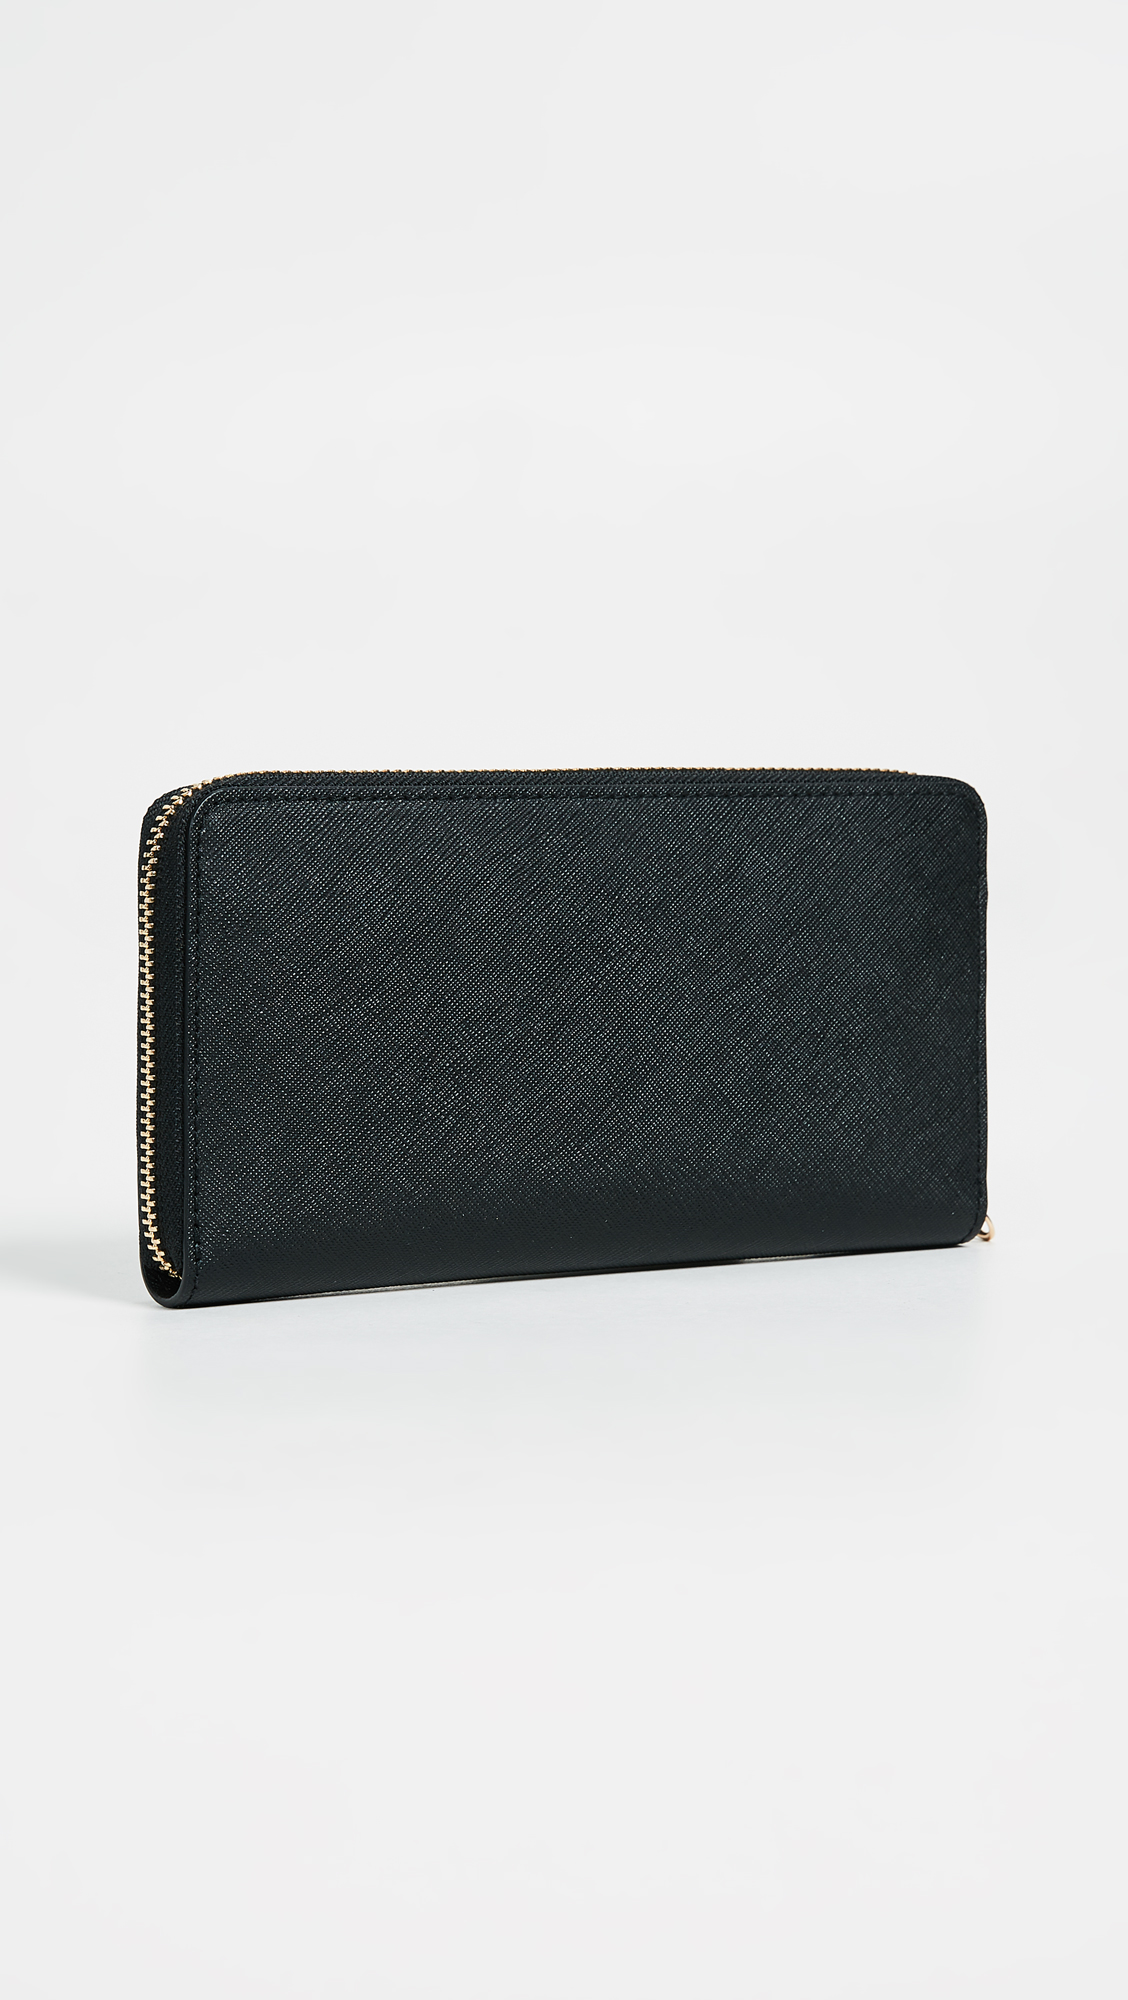 e17fee3926d Tory Burch Robinson Zip Continental Wallet | SHOPBOP